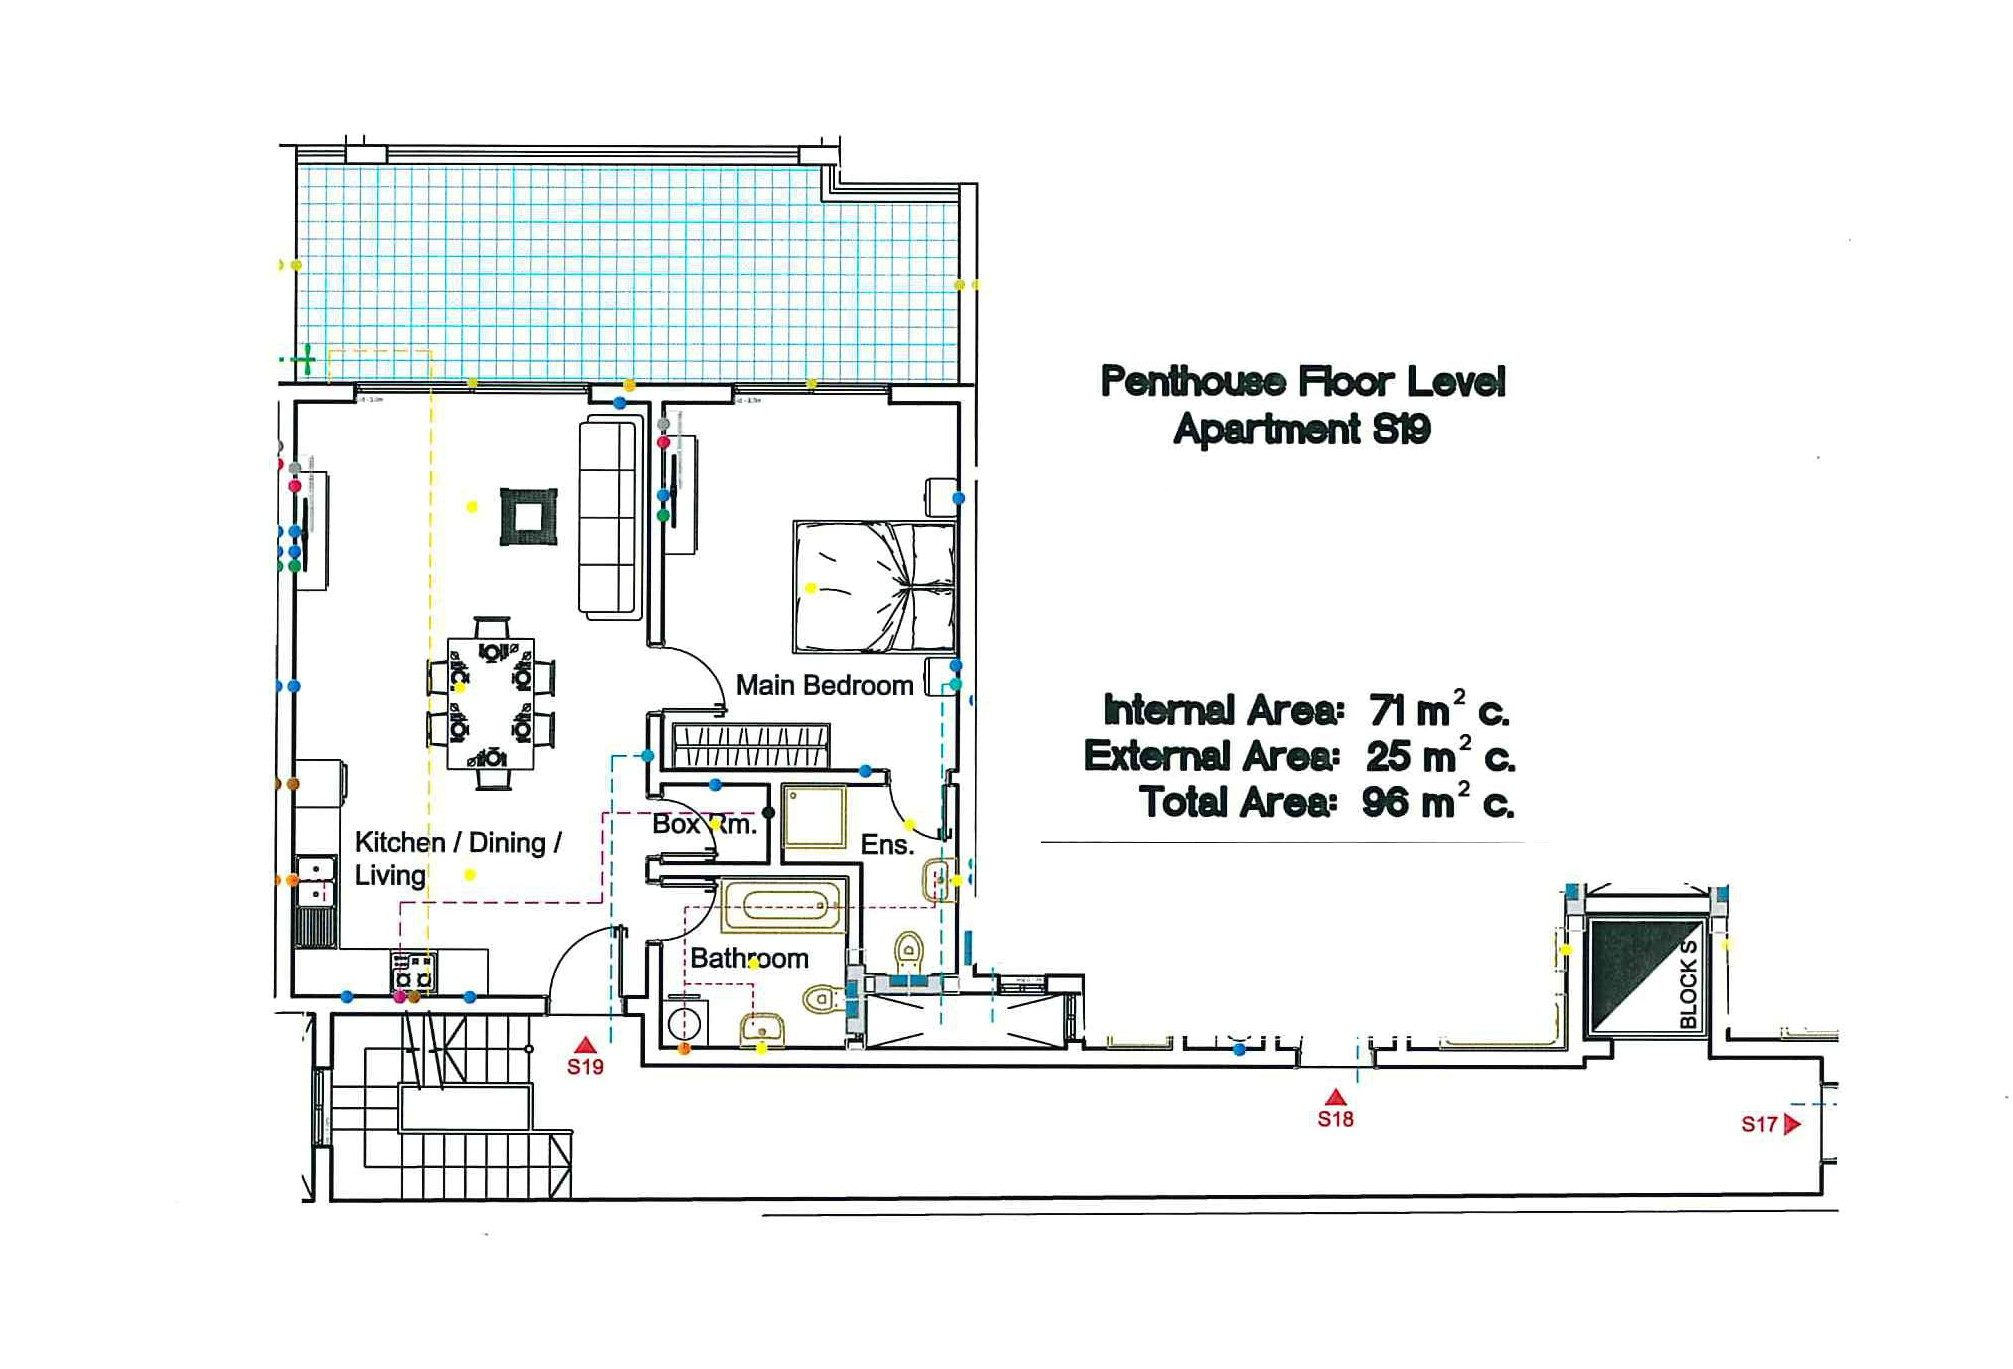 S19 Penthouse